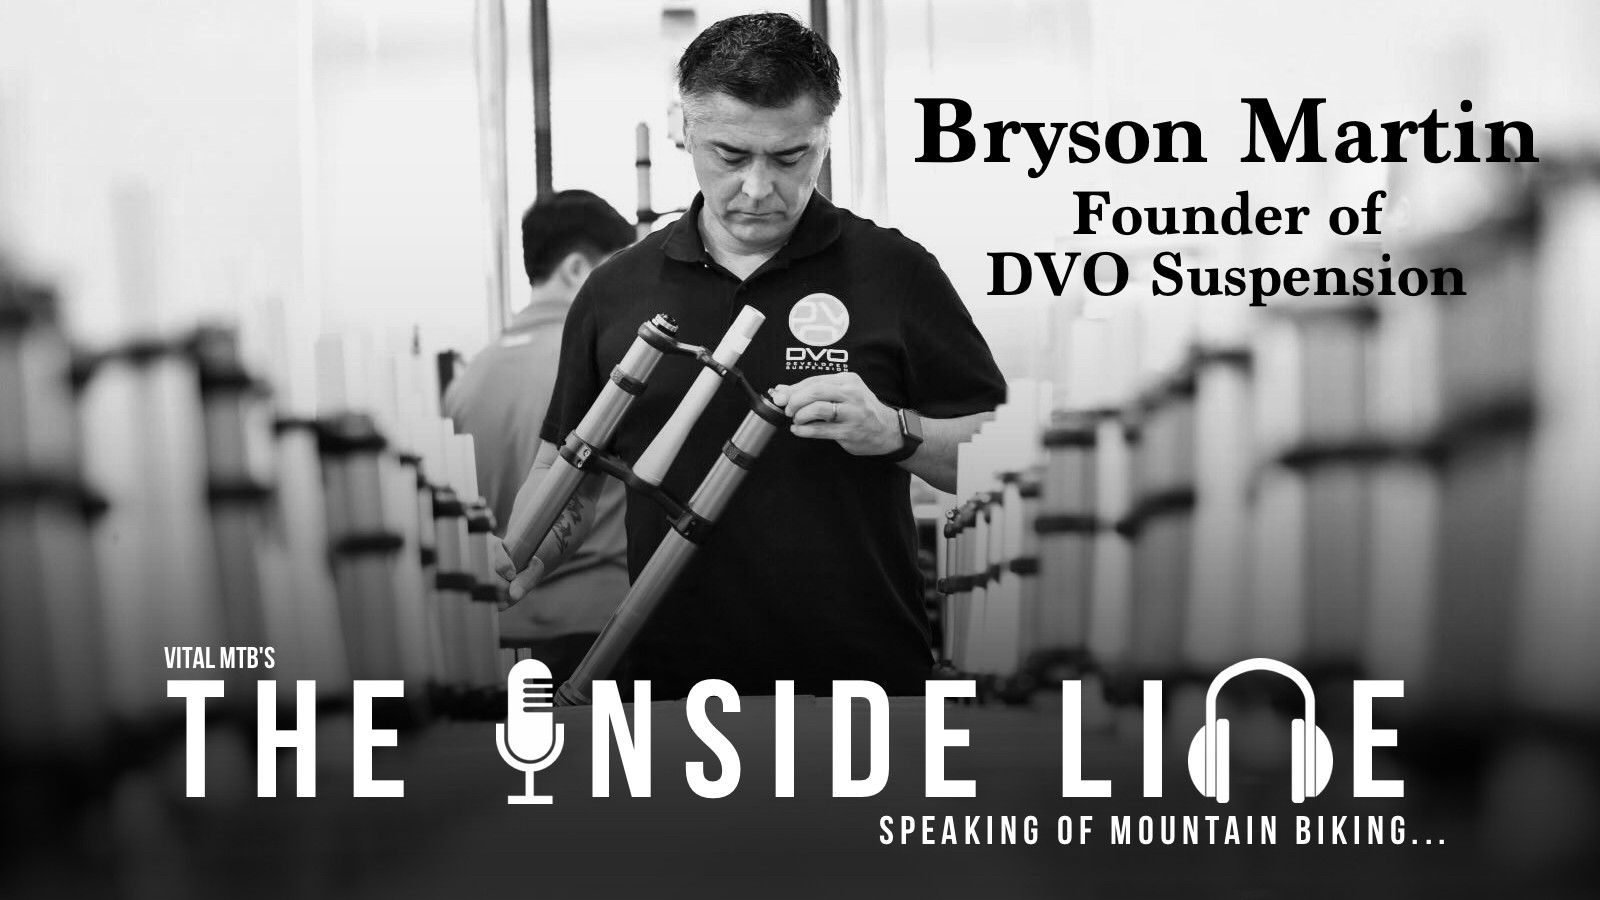 Vital MTB's The Inside Line Podcast - Episode 4 - Bryson Martin, Founder of DVO Suspension